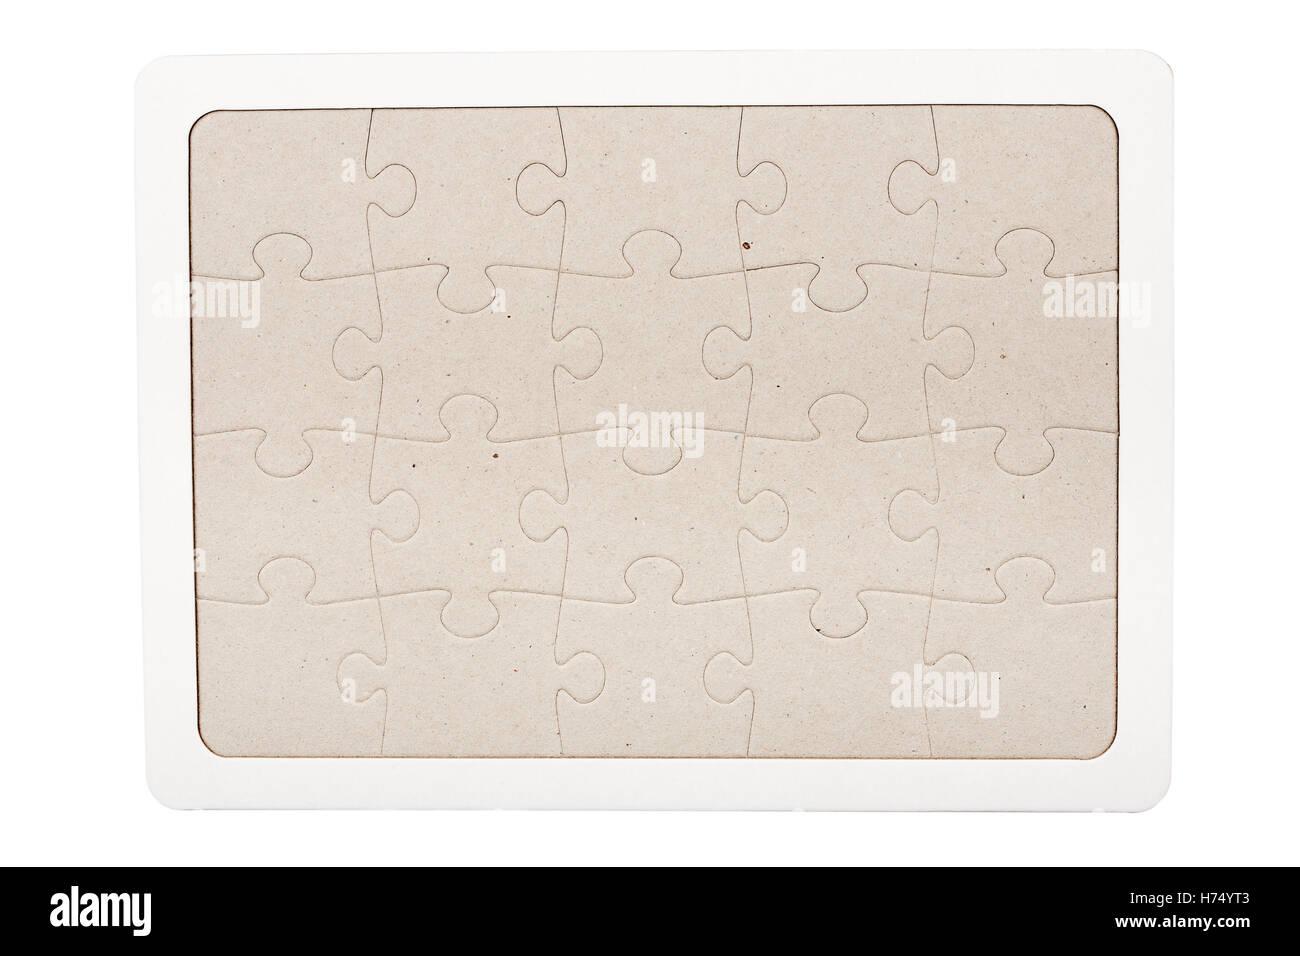 Jigsaw Puzzle Frame Stockfotos & Jigsaw Puzzle Frame Bilder - Seite ...